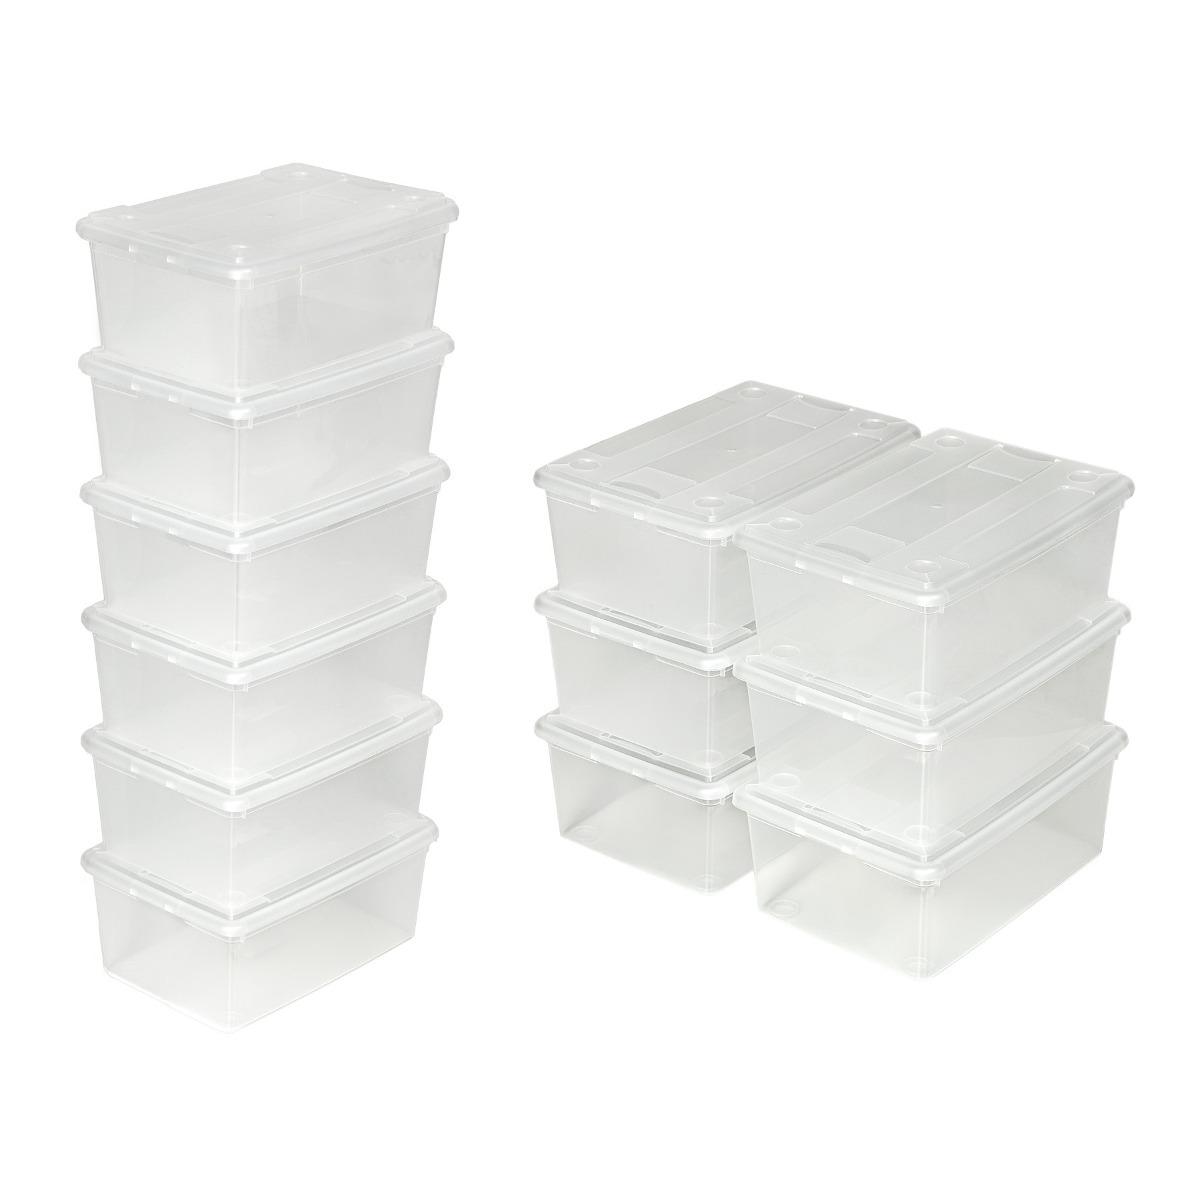 Cajas De Plastico Organizadoras Para Zapatos En Mercado Libre M Xico ~ Cajas Transparentes Para Zapatos